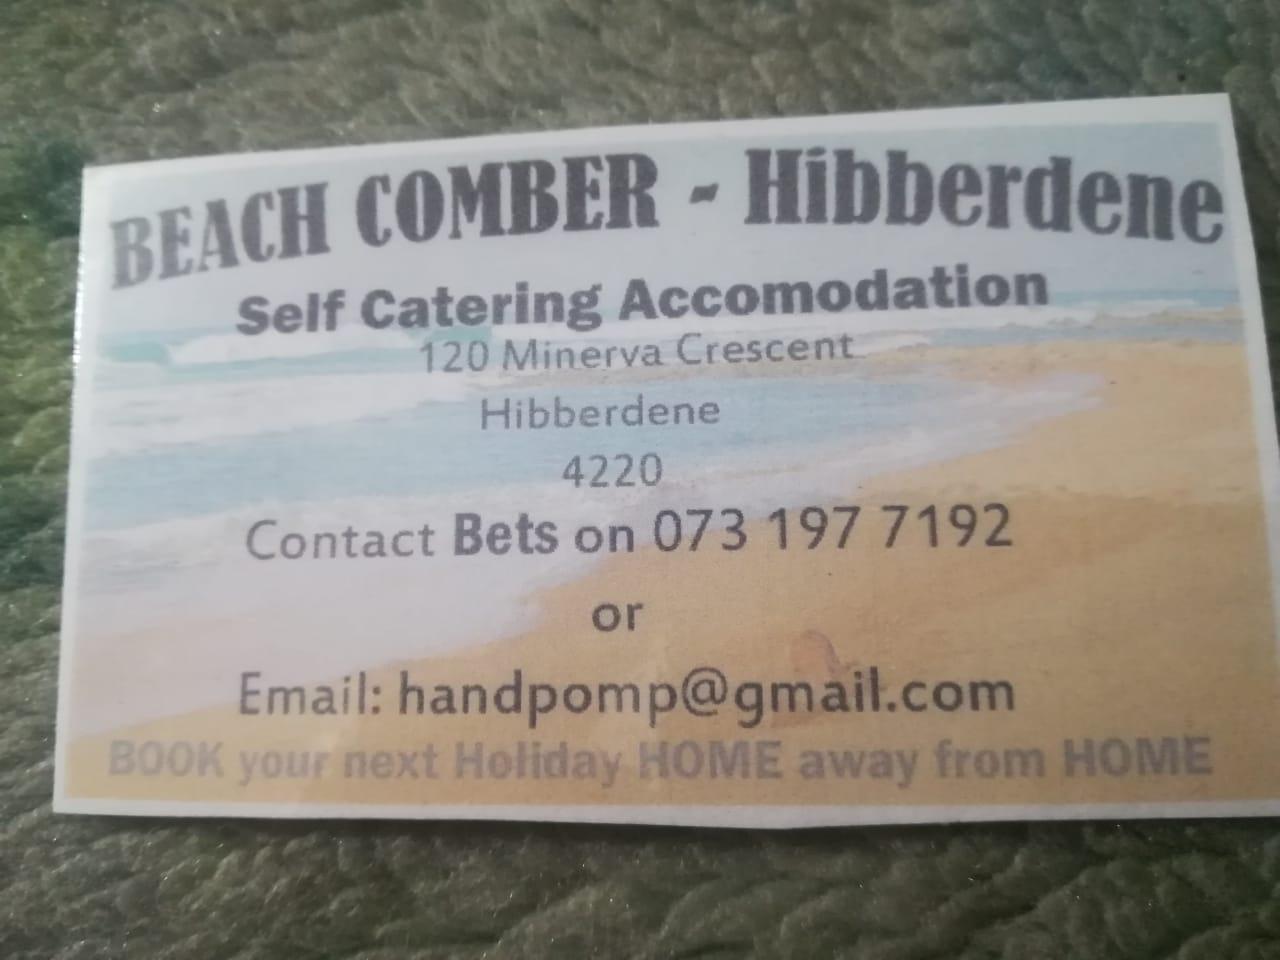 Beach Comber - Hibberdene